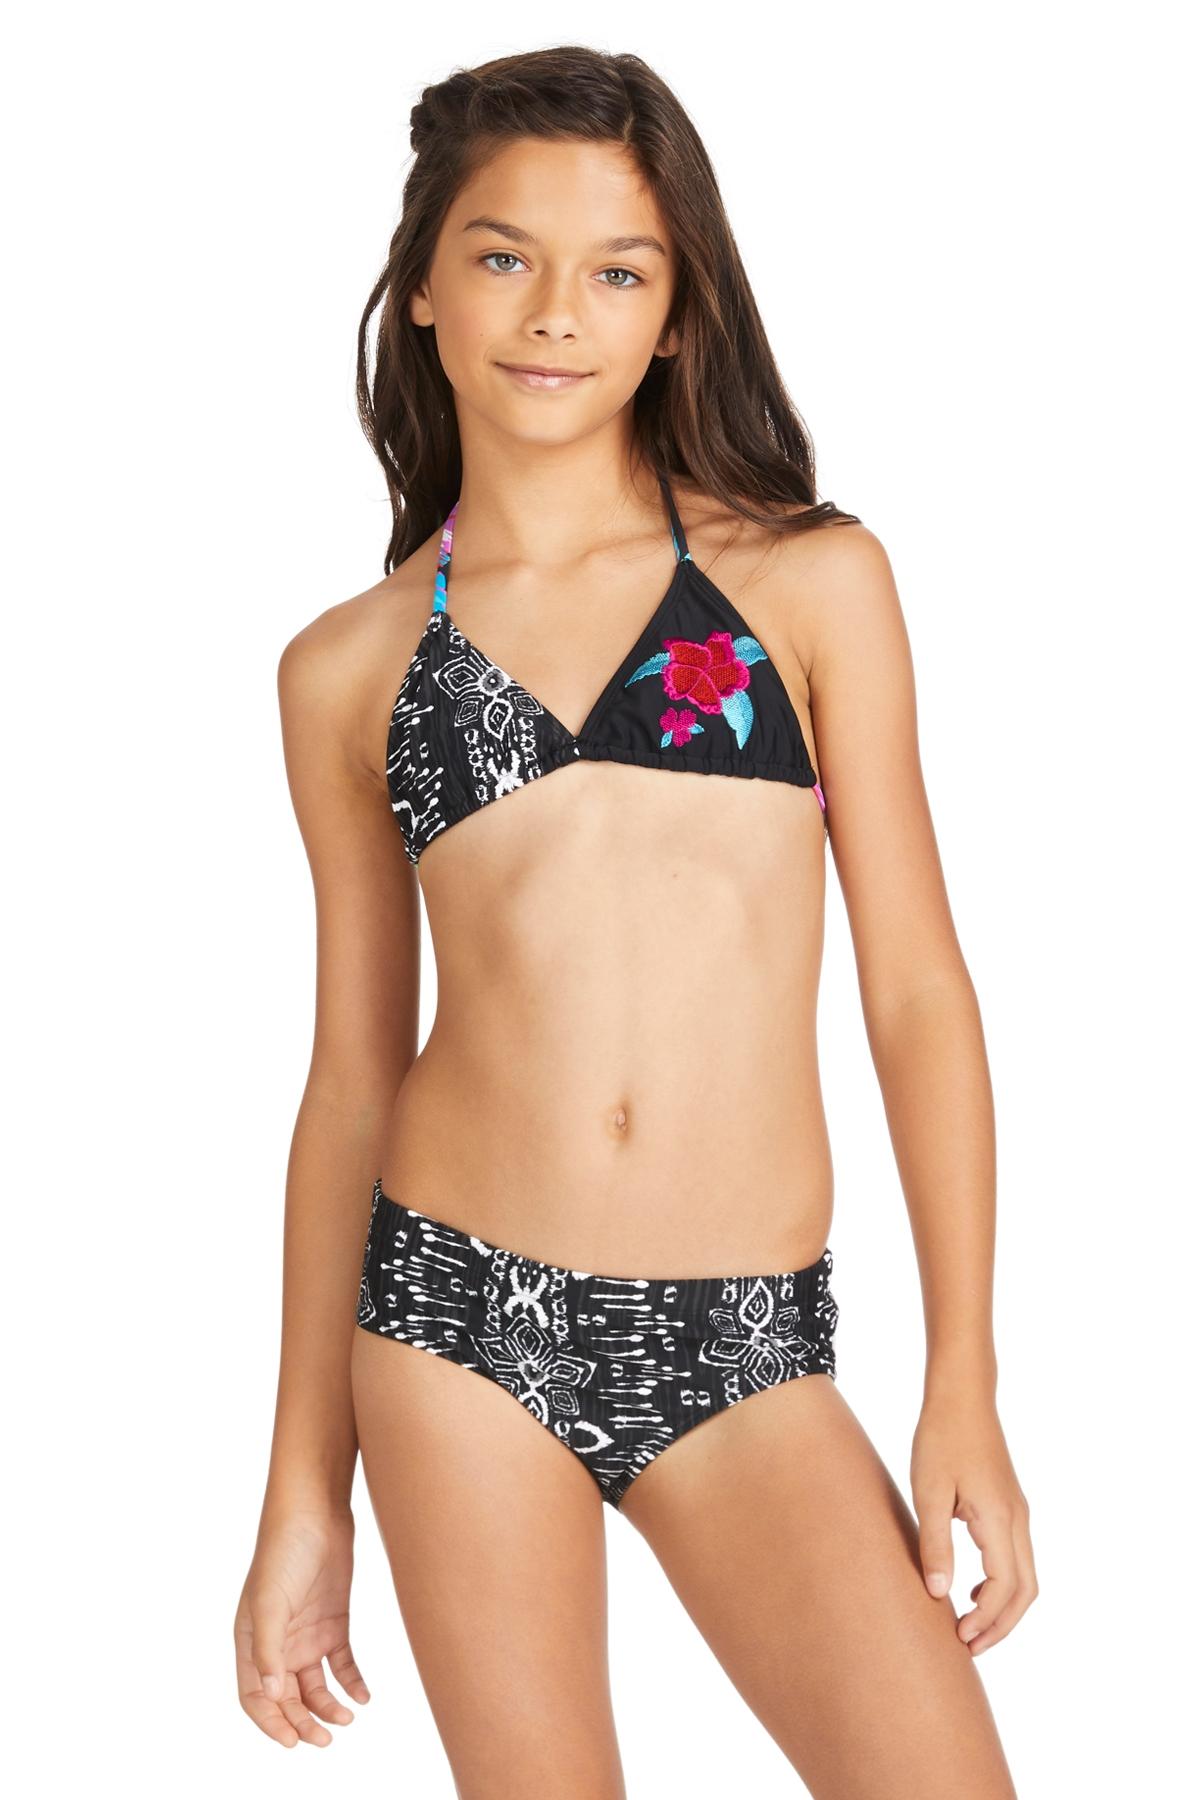 Raisins Girls Half Moon Coconut Beach Triangle Set 7